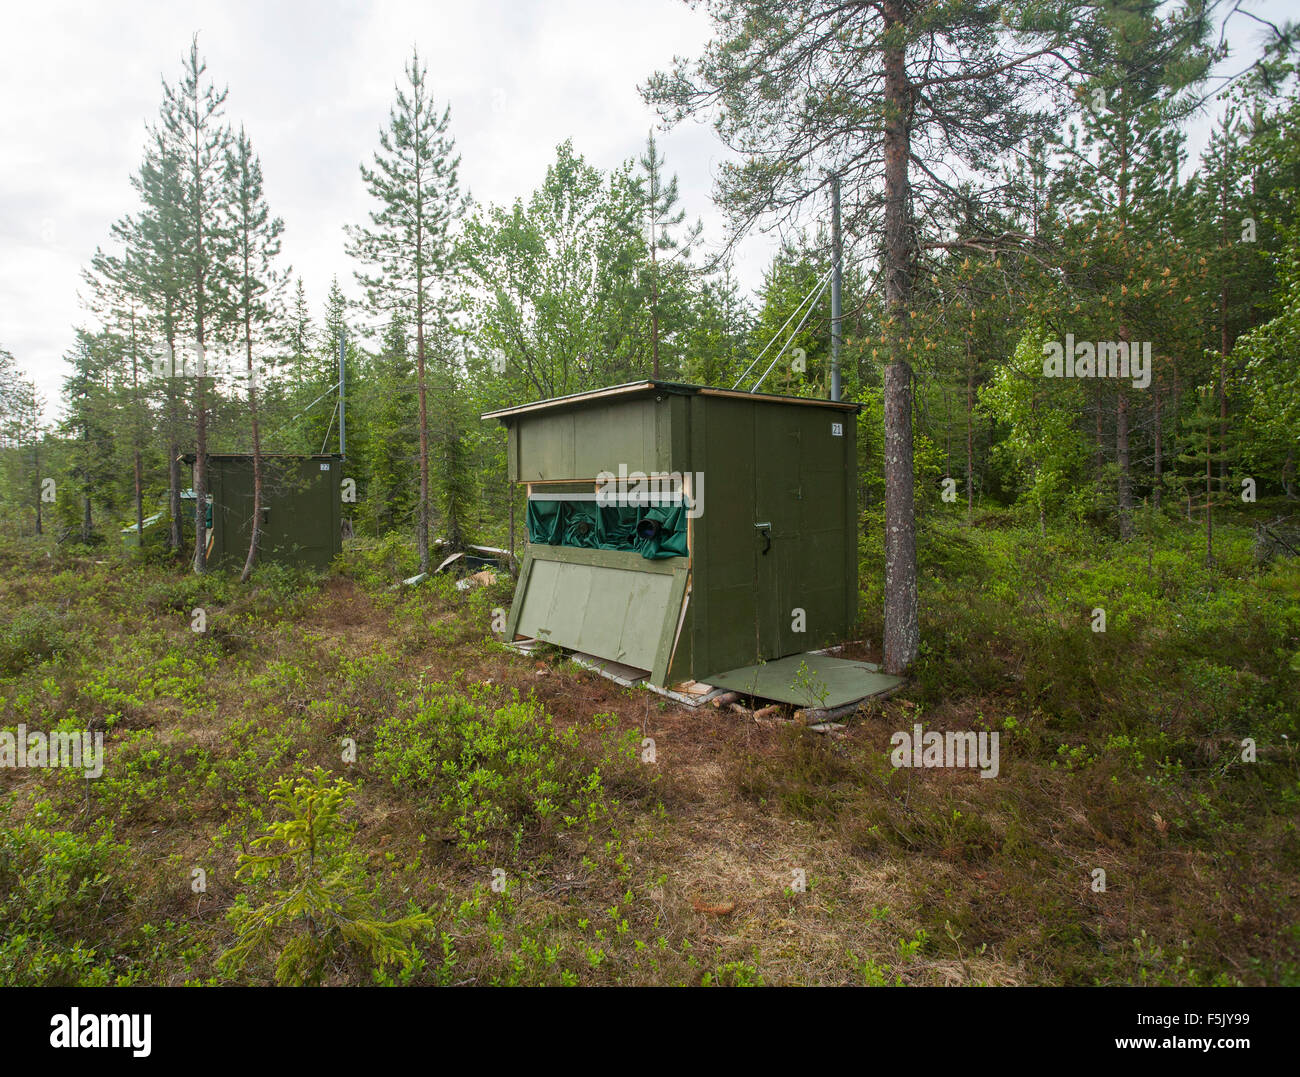 Observation lodges in Finnish Taiga, Kainuu, North Karelia, Finland - Stock Image